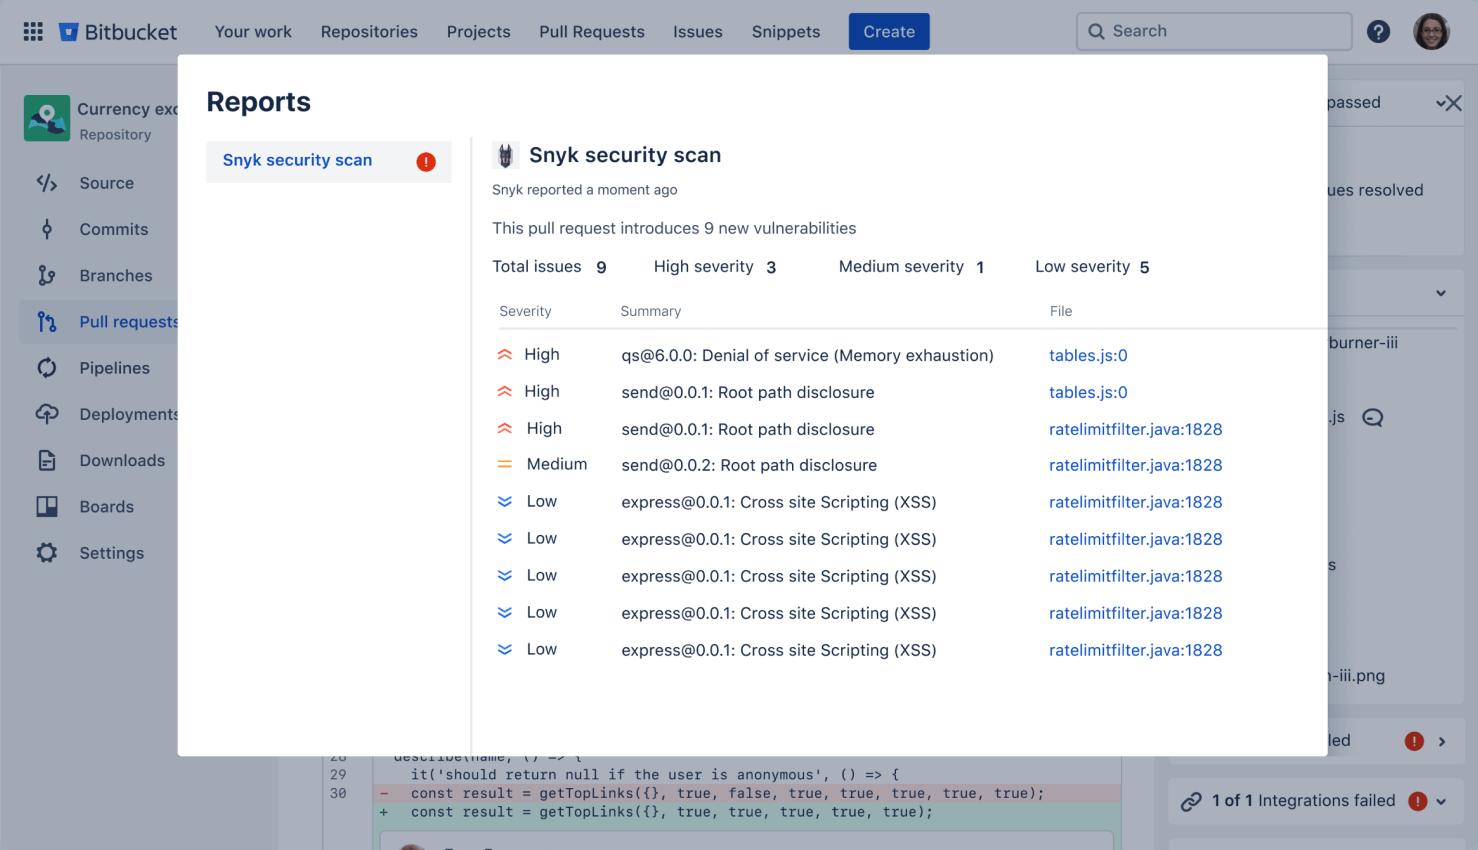 Branch permissions screen